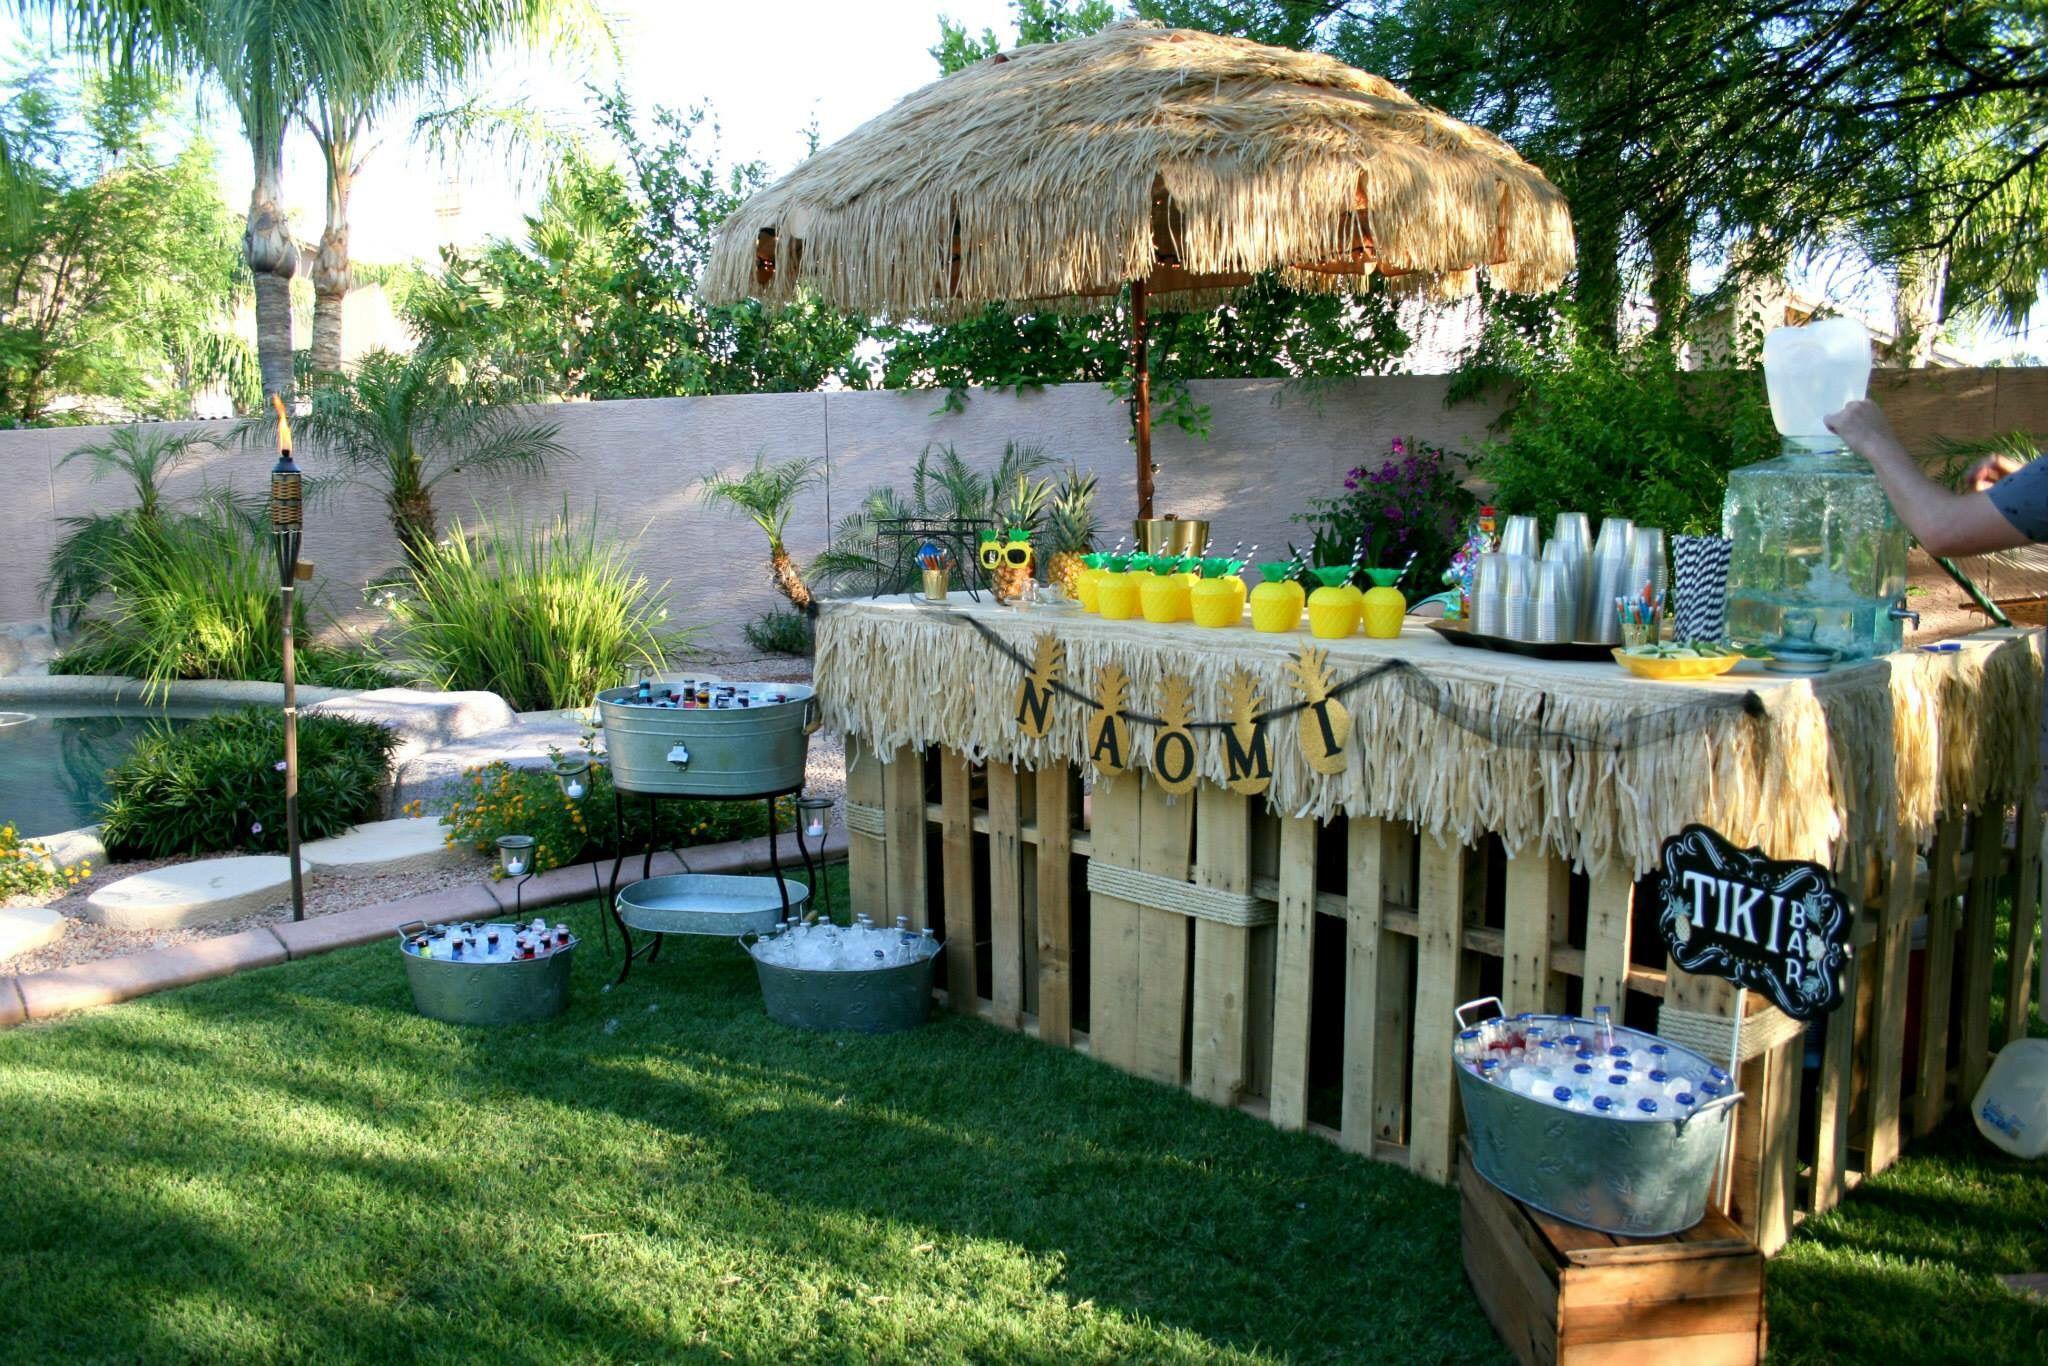 Tiki Bar At A Party Like Pineapple Themed Backyard Graduation Black And White